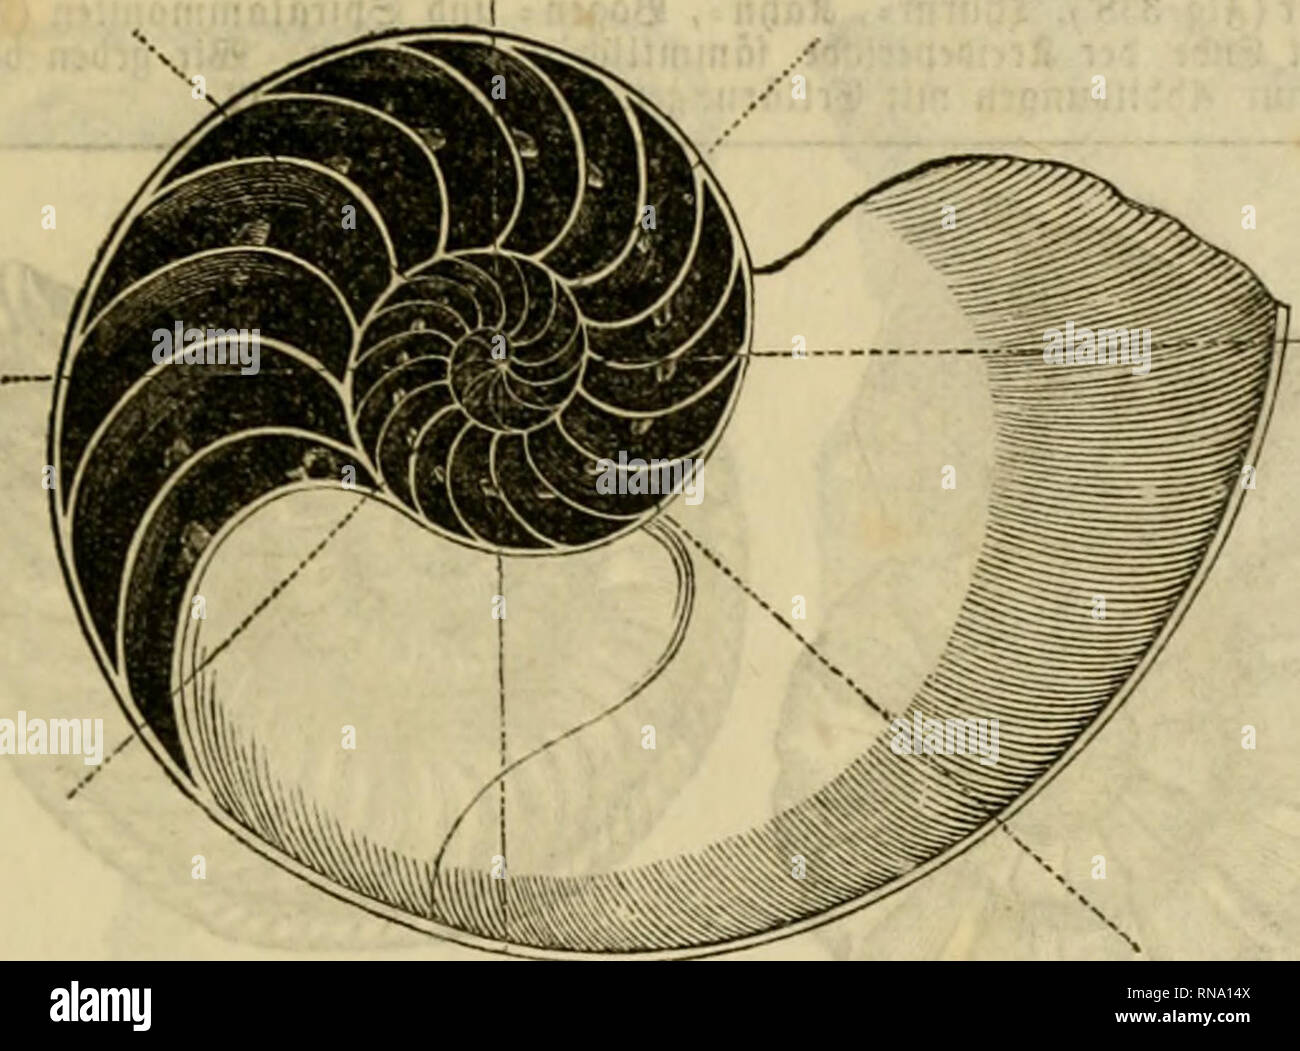 . Analytischer Leitfaden für den ersten wissenschaftlichen Unterricht in der Naturgeschichte. Animals. IX. ÄlafTf. 9Bflcf)tl)iere (Mollusca). 153 8. 21f. 819 329. (Sd)iffdbDOt (Nau- tilus ponipiltus). 3m Duerburcf)- fd)iiitte, um bitfl)m: tiutrifd) gebilbtttn Änmmern unb bie Sdöljre ju zeigen, tiflc{)e burd) aüt Änmmern gctjt.. Please note that these images are extracted from scanned page images that may have been digitally enhanced for readability - coloration and appearance of these illustrations may not perfectly resemble the original work.. Leunis, Johannes, 1802-1873; Metcalf Collection  Stock Photo